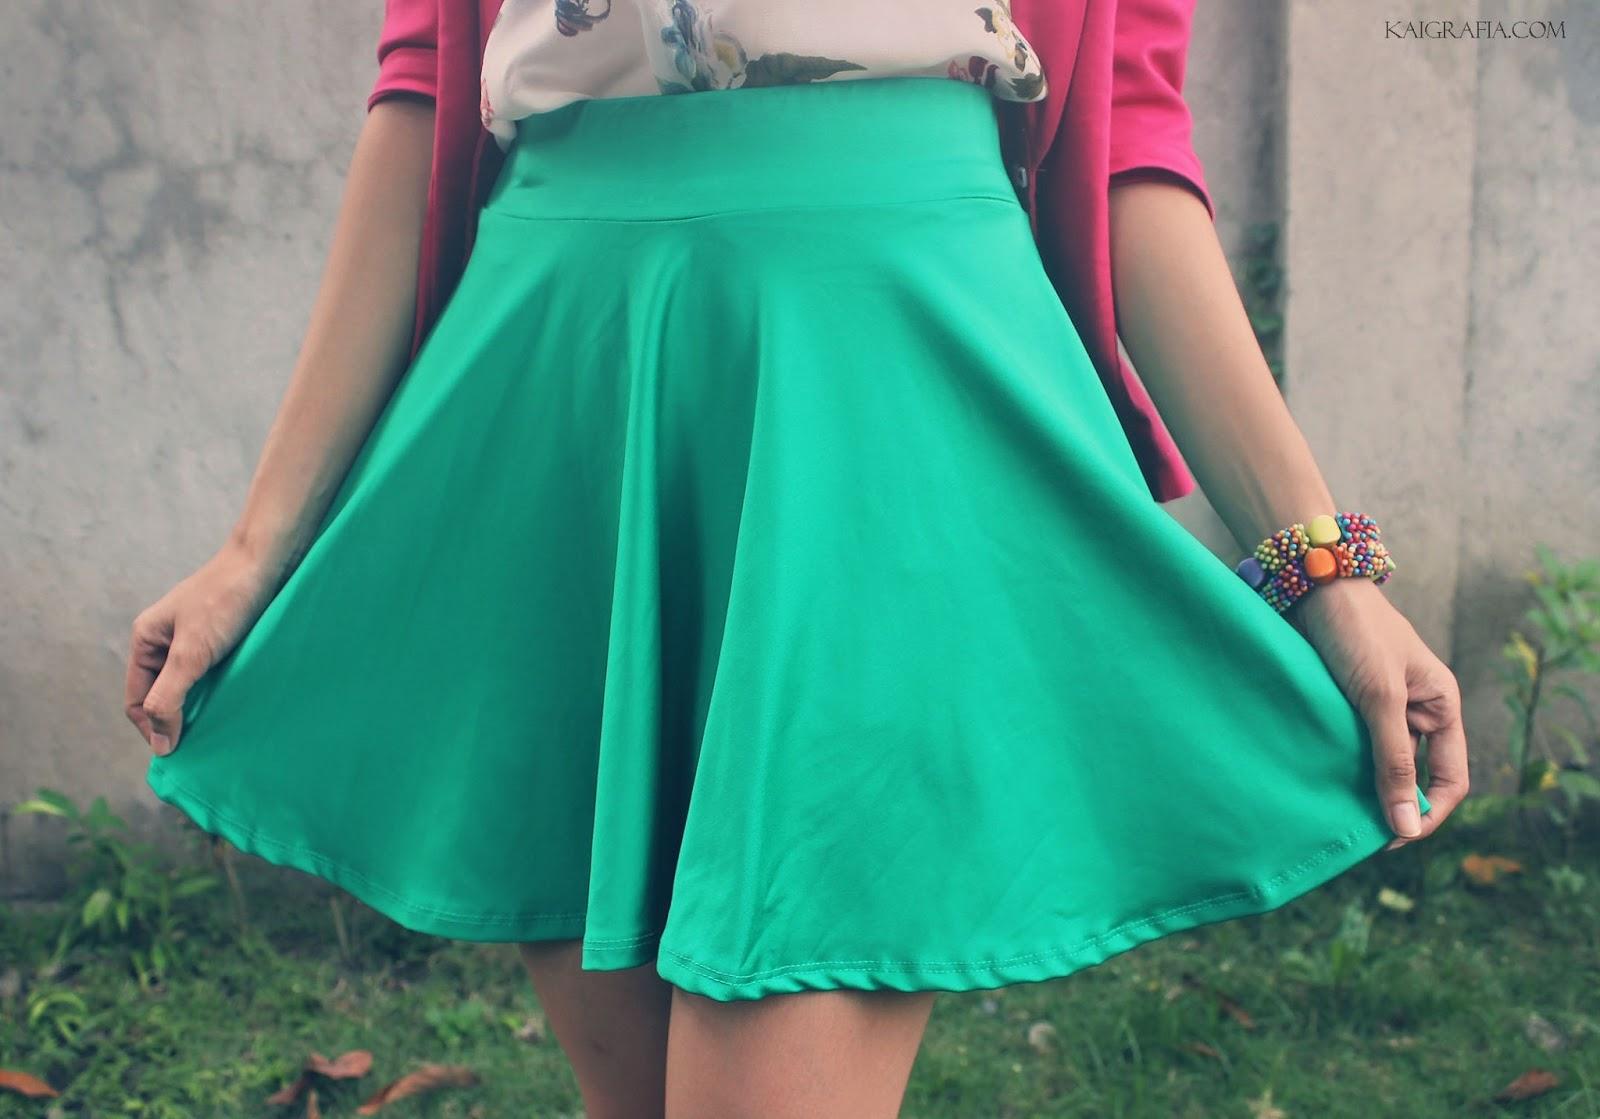 Colored Skater Skirt Philippines